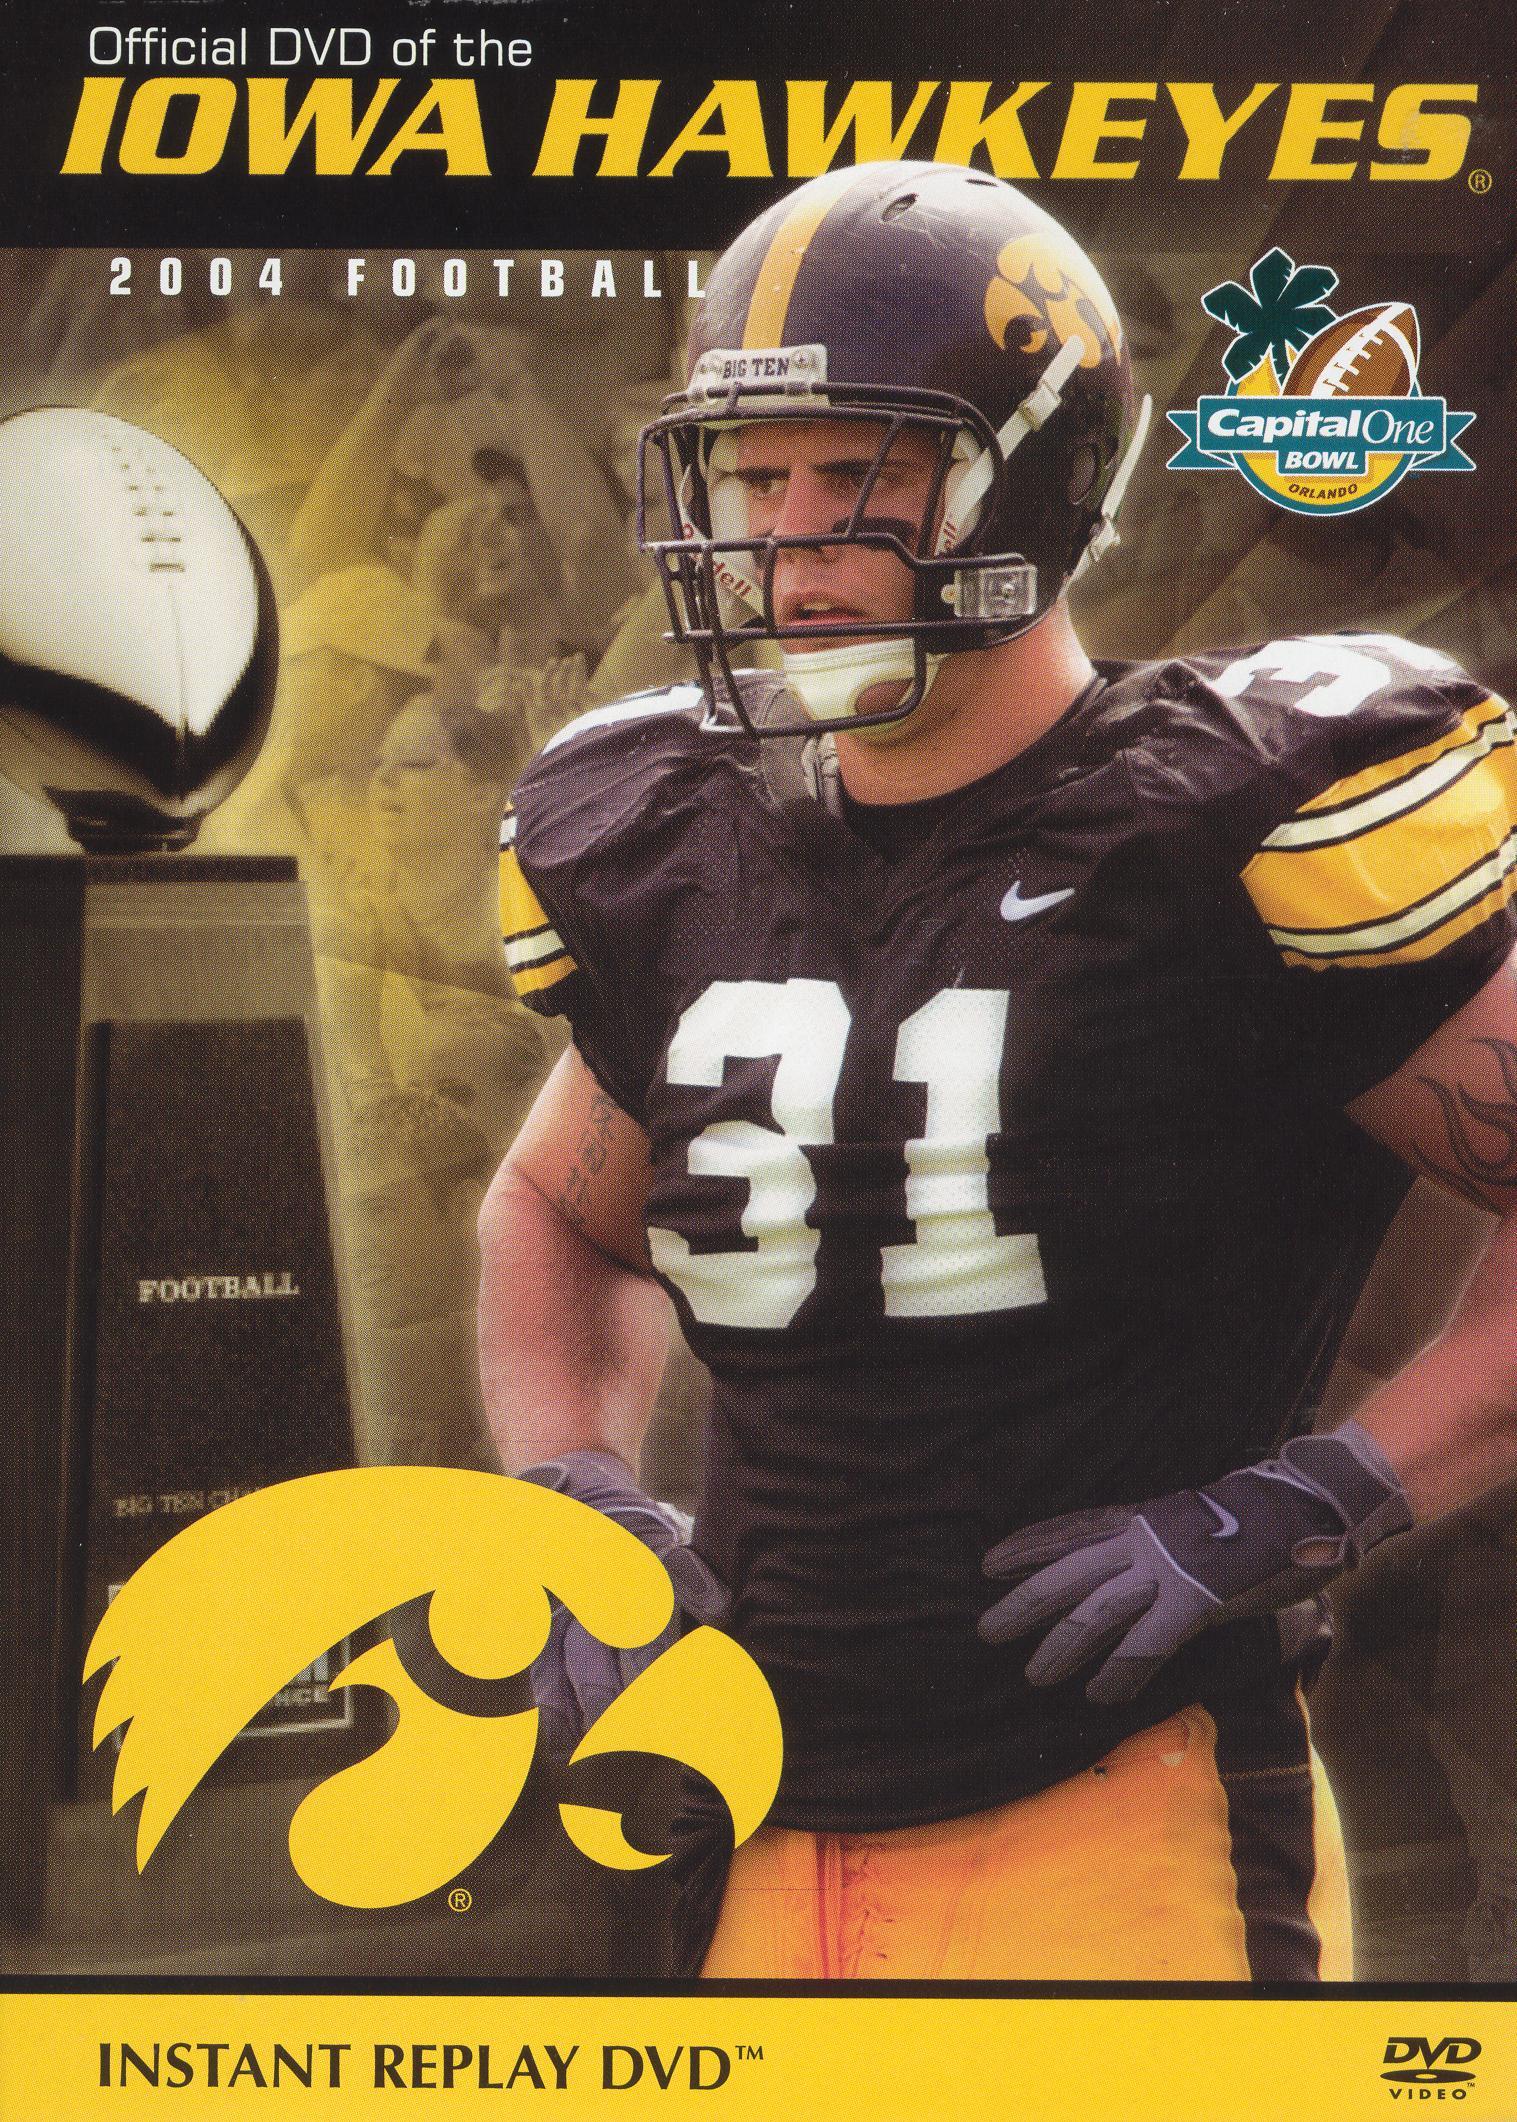 2004 Football Instant Replay: Iowa Hawkeyes